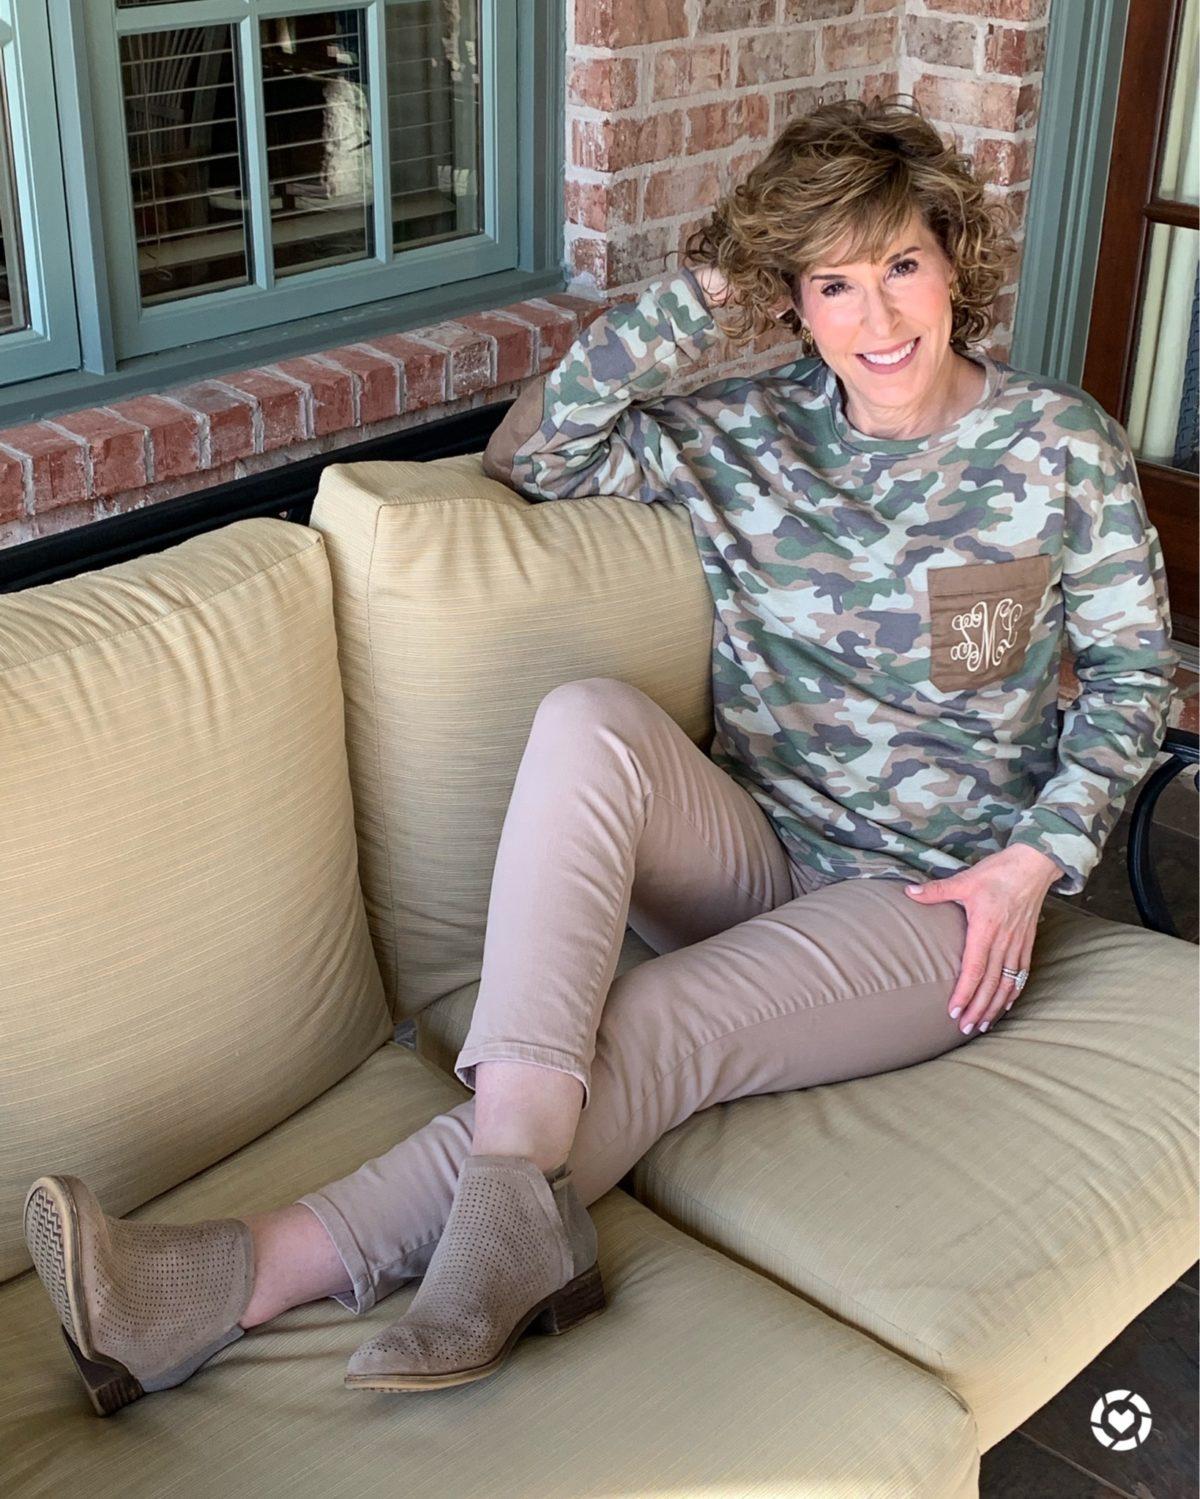 woman wearing camo monogram sweatshirt lounging on sofa